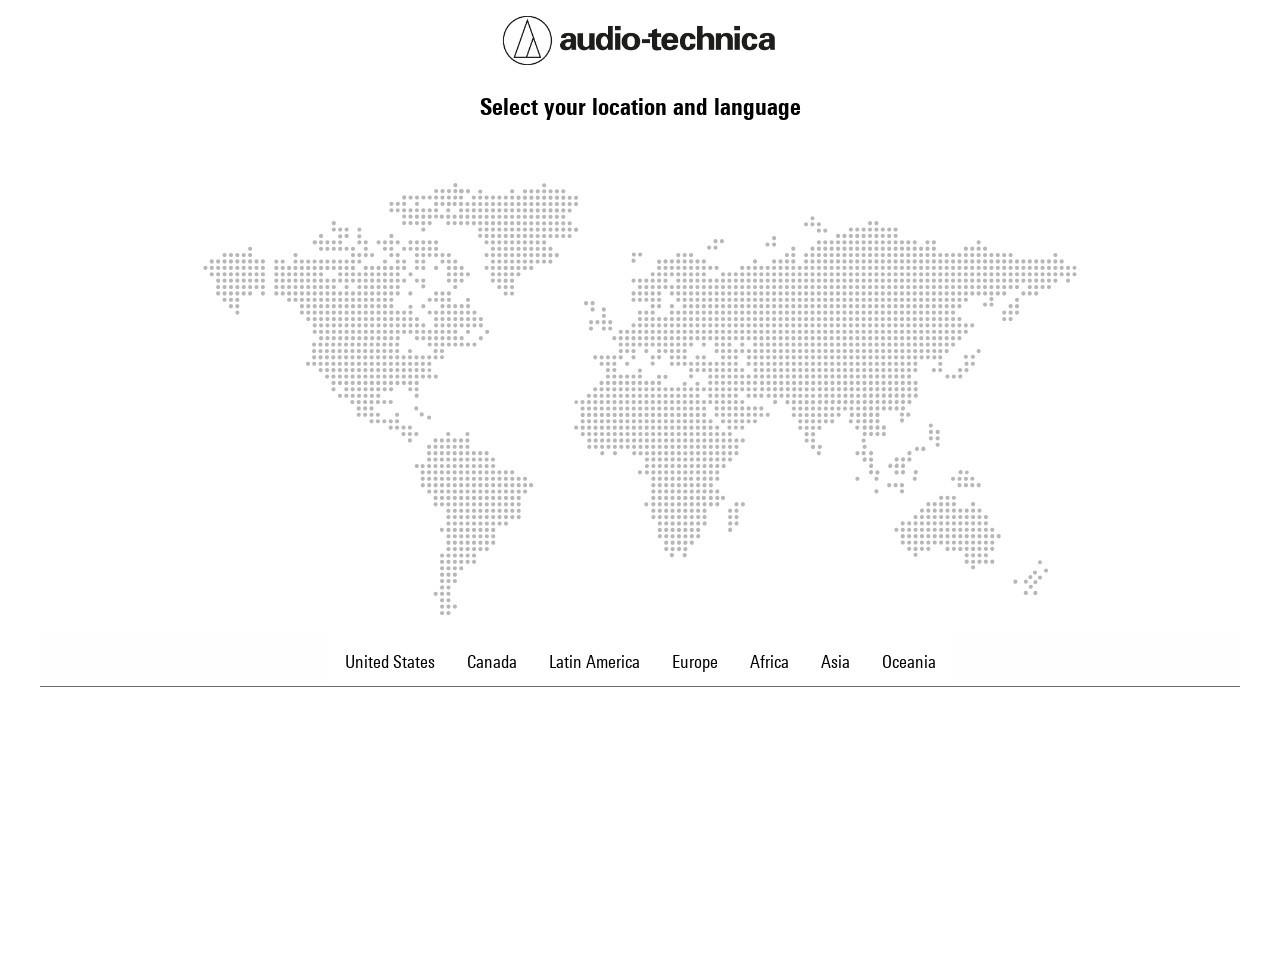 audio-technica.com